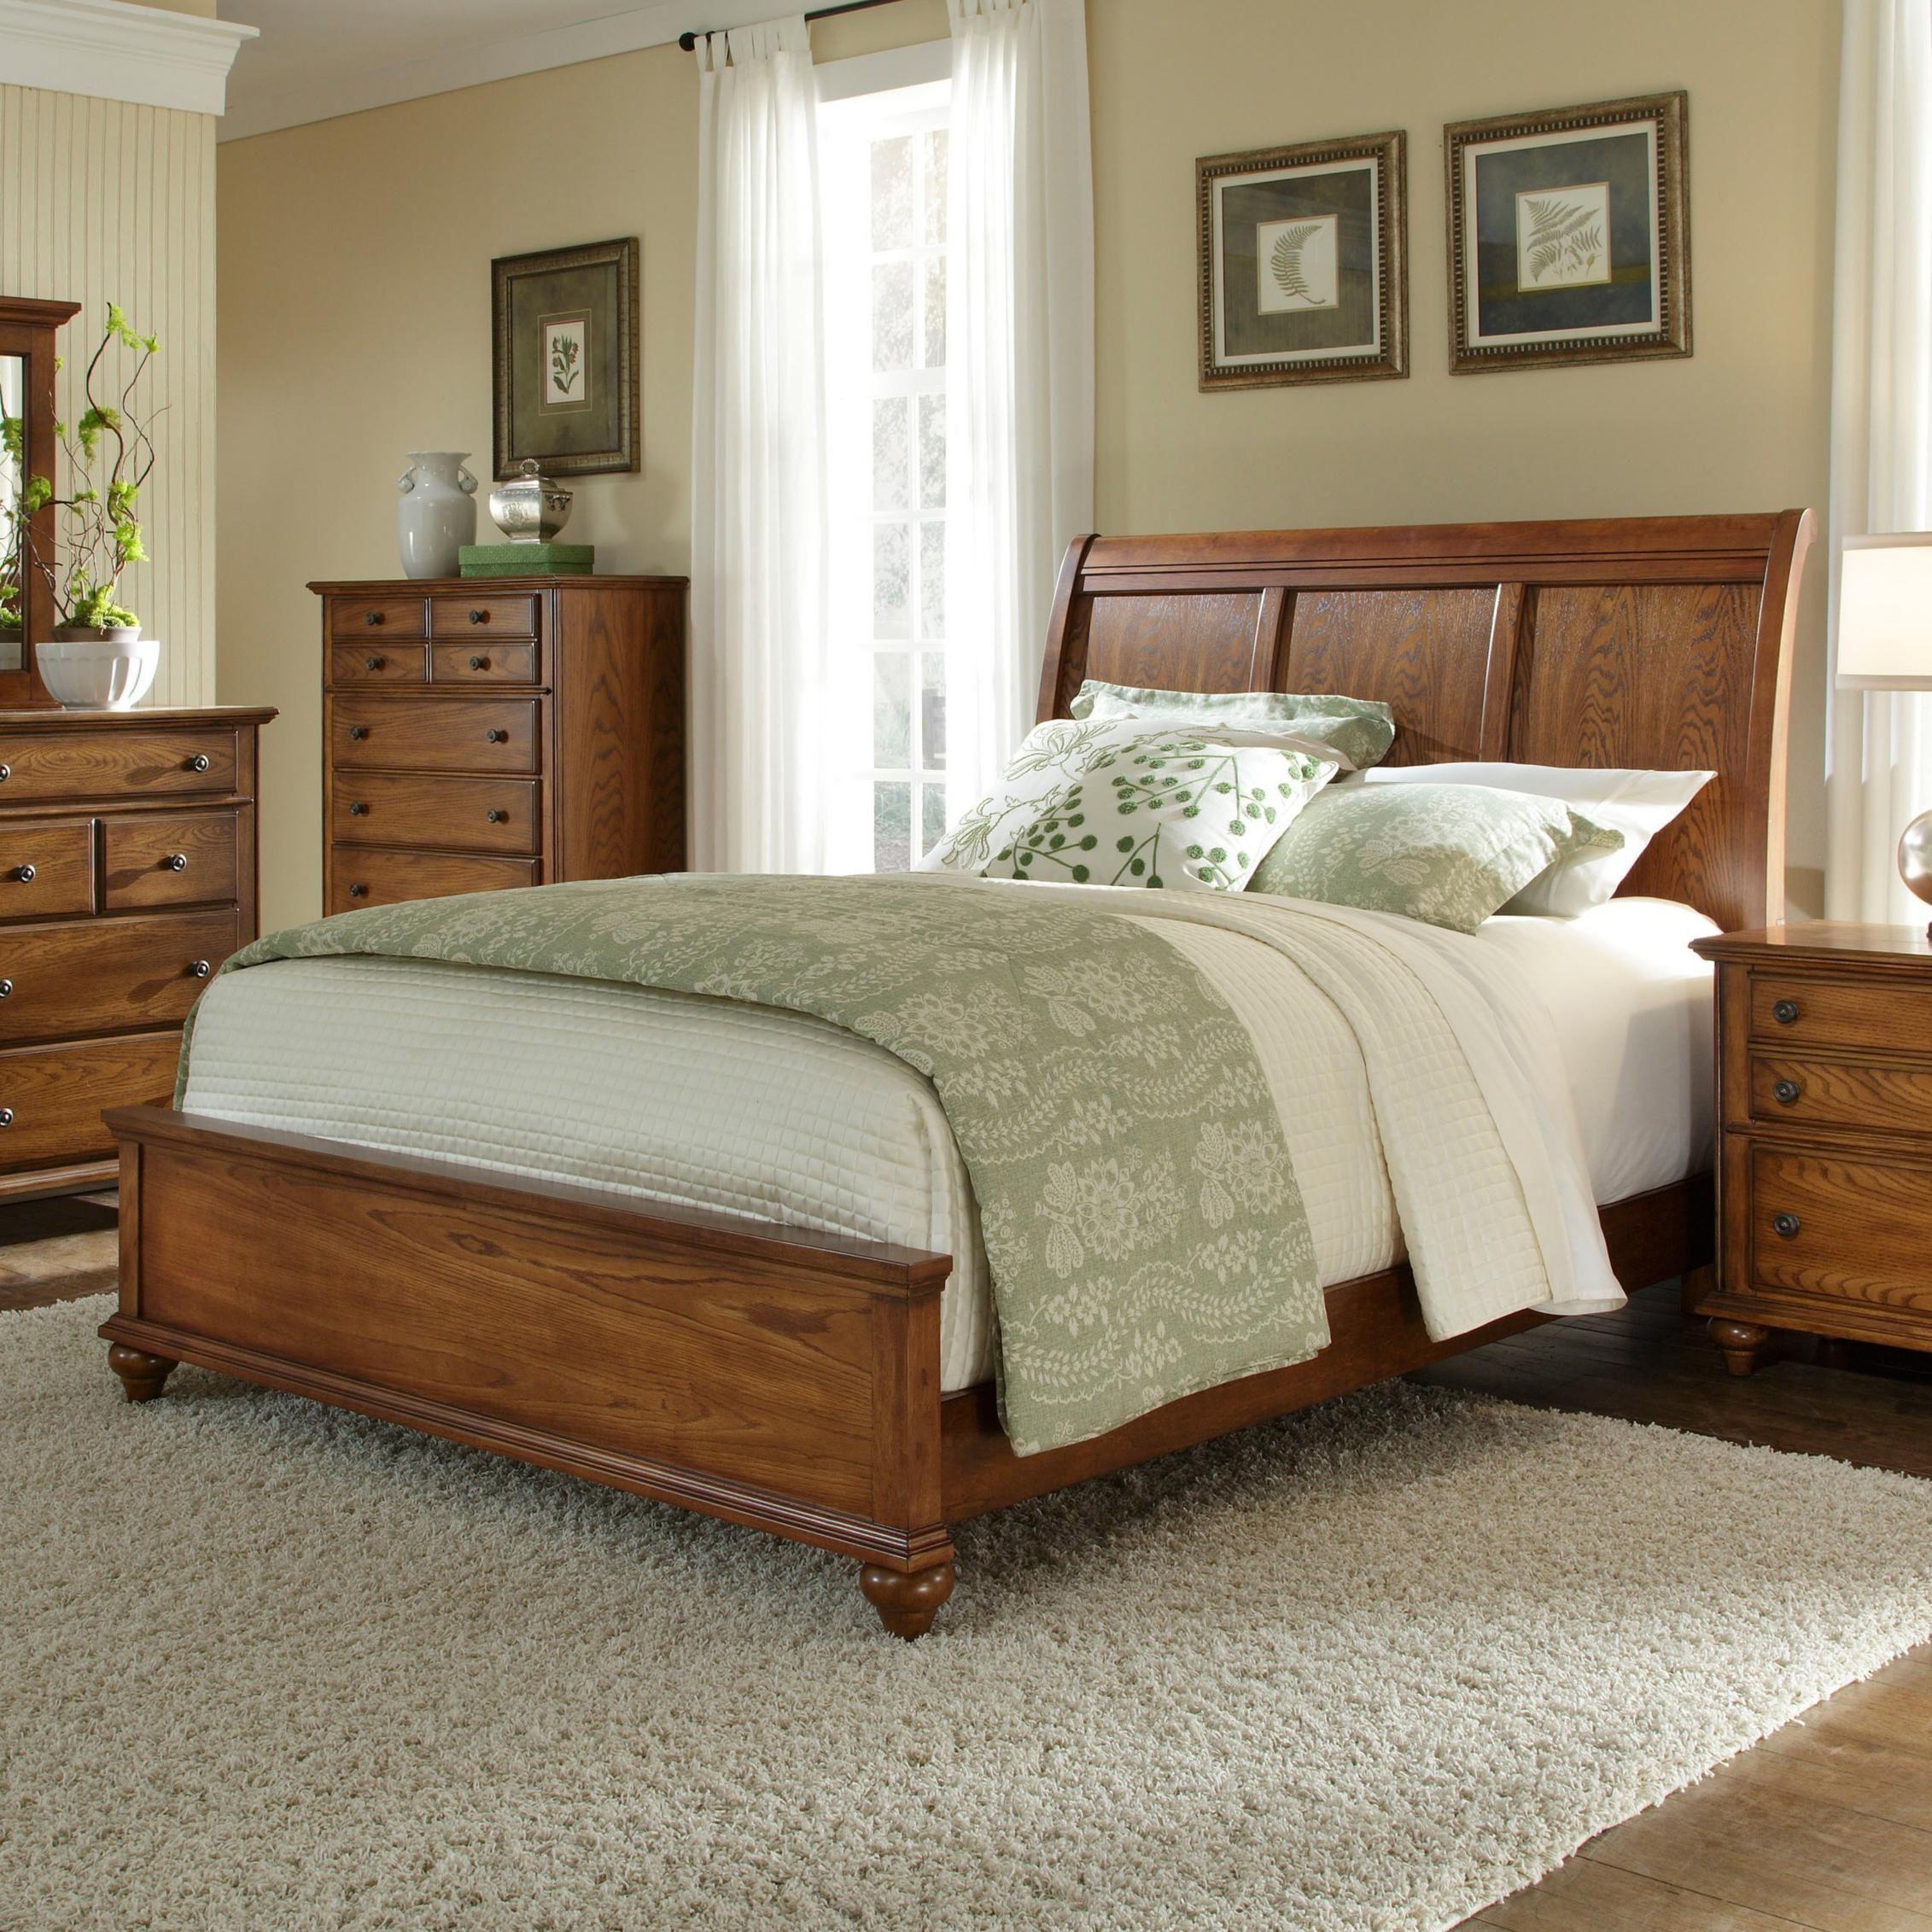 Broyhill Sofa Nebraska Furniture Mart Set Indian Designs Hayden Place King Bed With Sleigh Headboard By